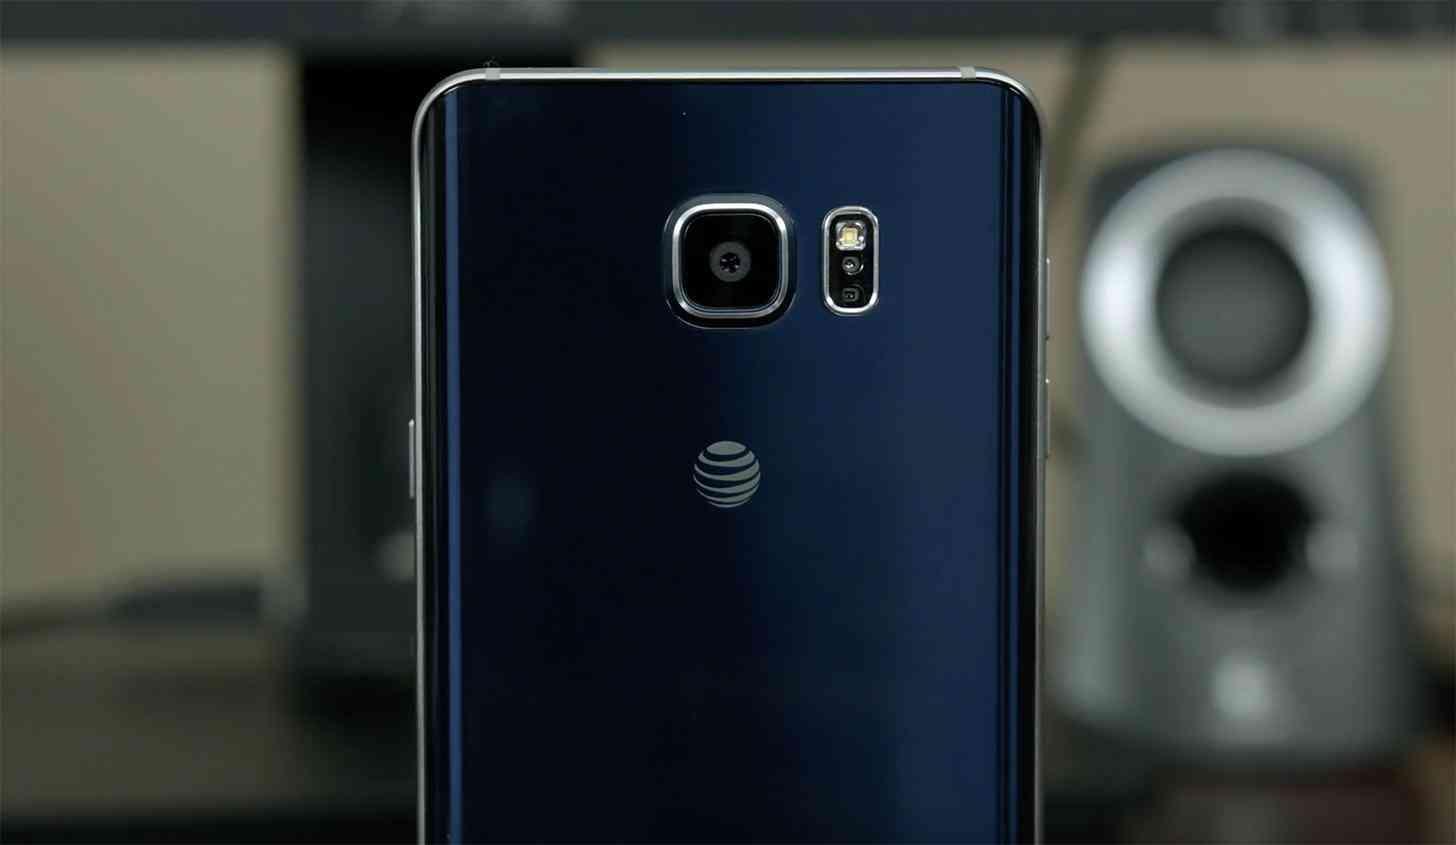 AT&T Galaxy Note 5